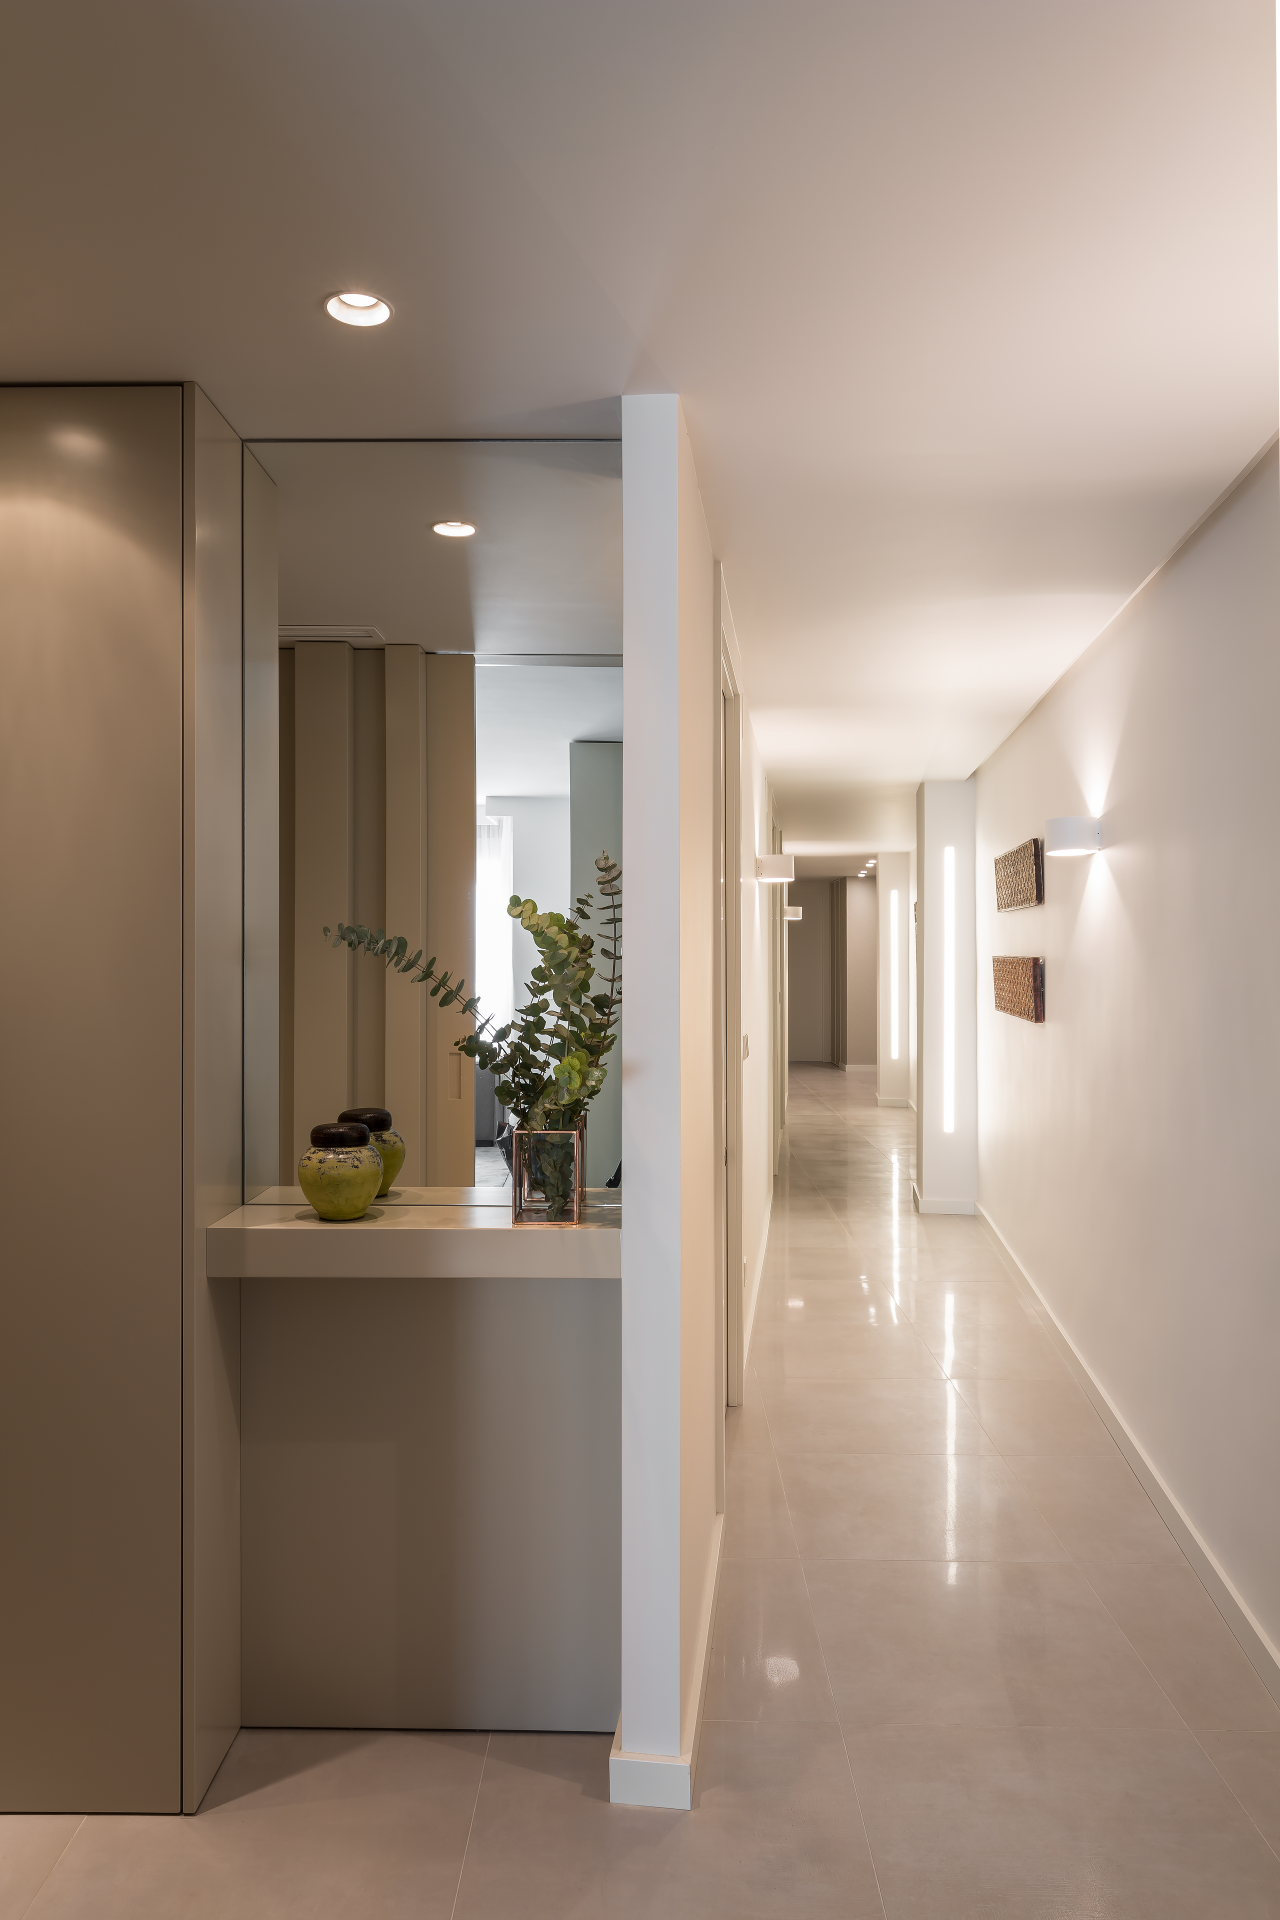 fotografia-arquitectura-interiorismo-valencia-fenollar-german-cabo-laura-yerpes (9)